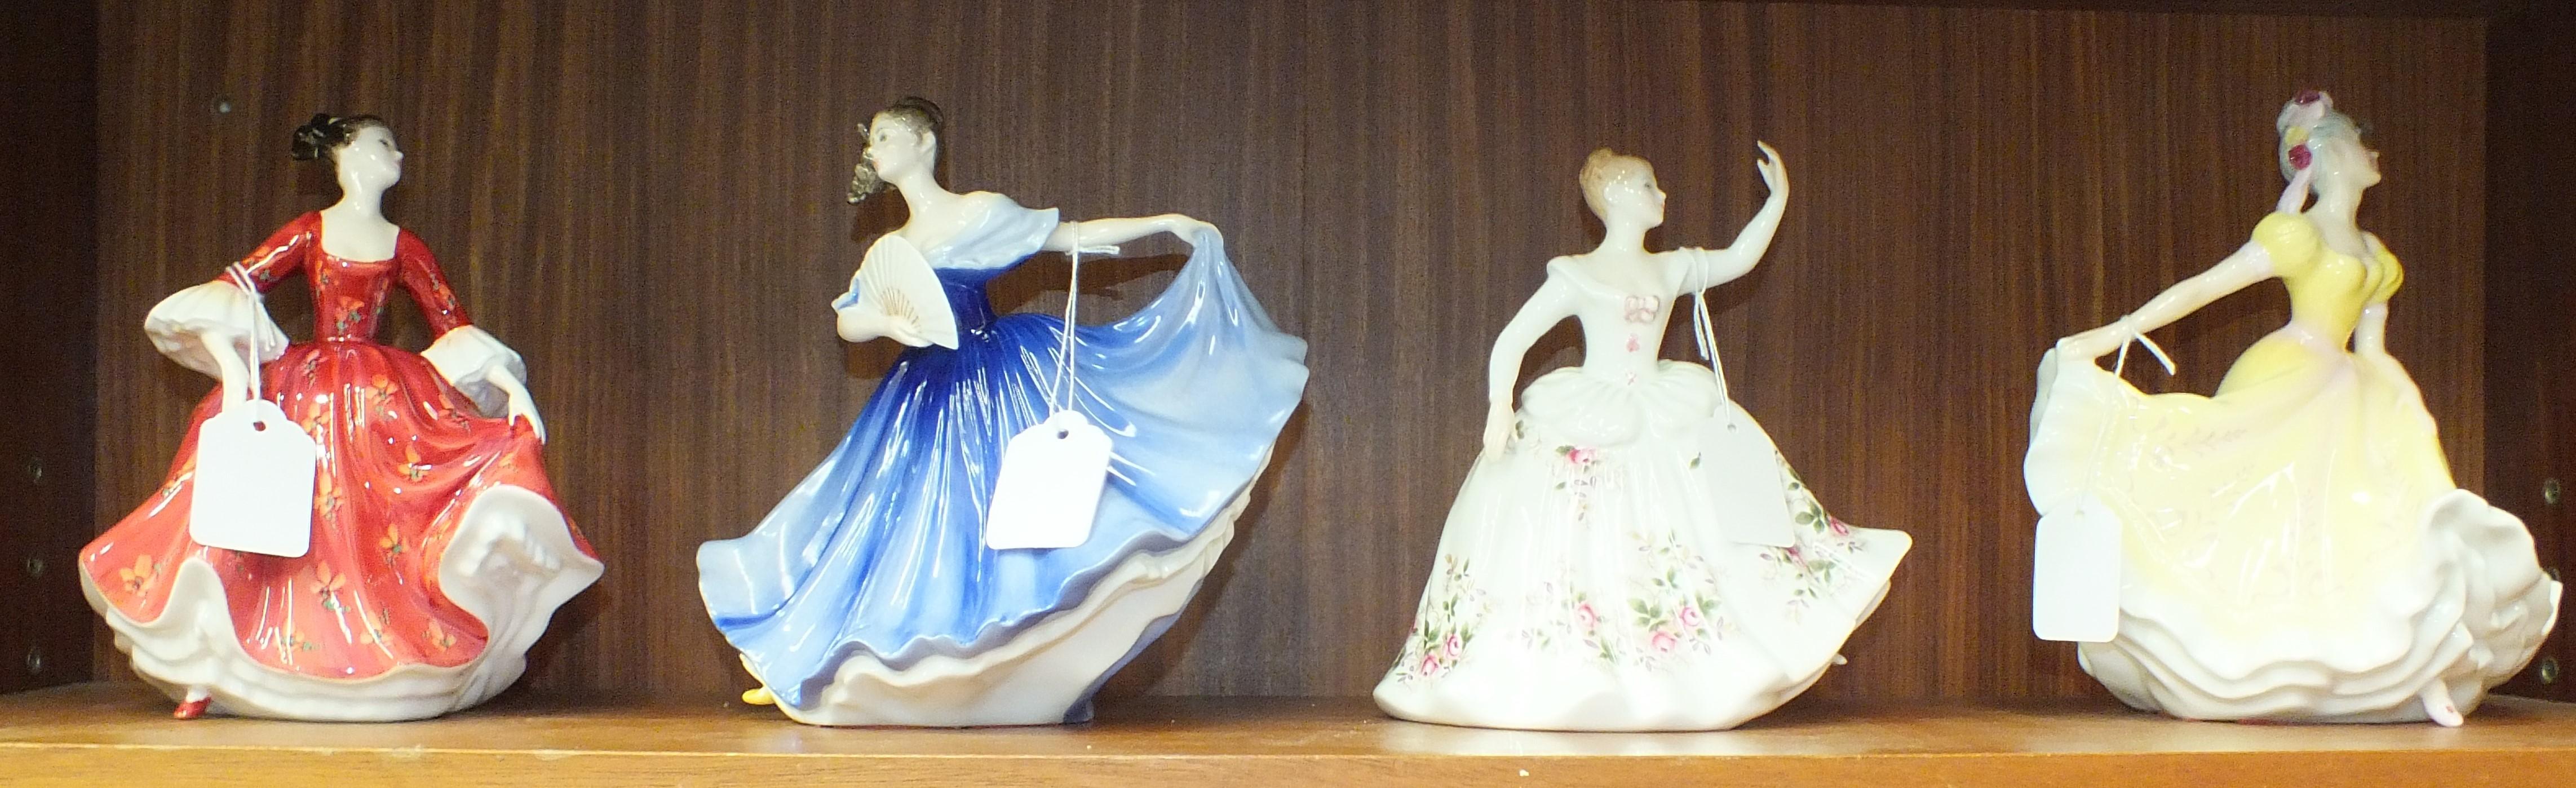 Lot 126 - Four Royal Doulton figurines: 'Ninette' HN2379, 'Stephanie' HN2811, 'Elaine' HN2791 and 'Shirley'